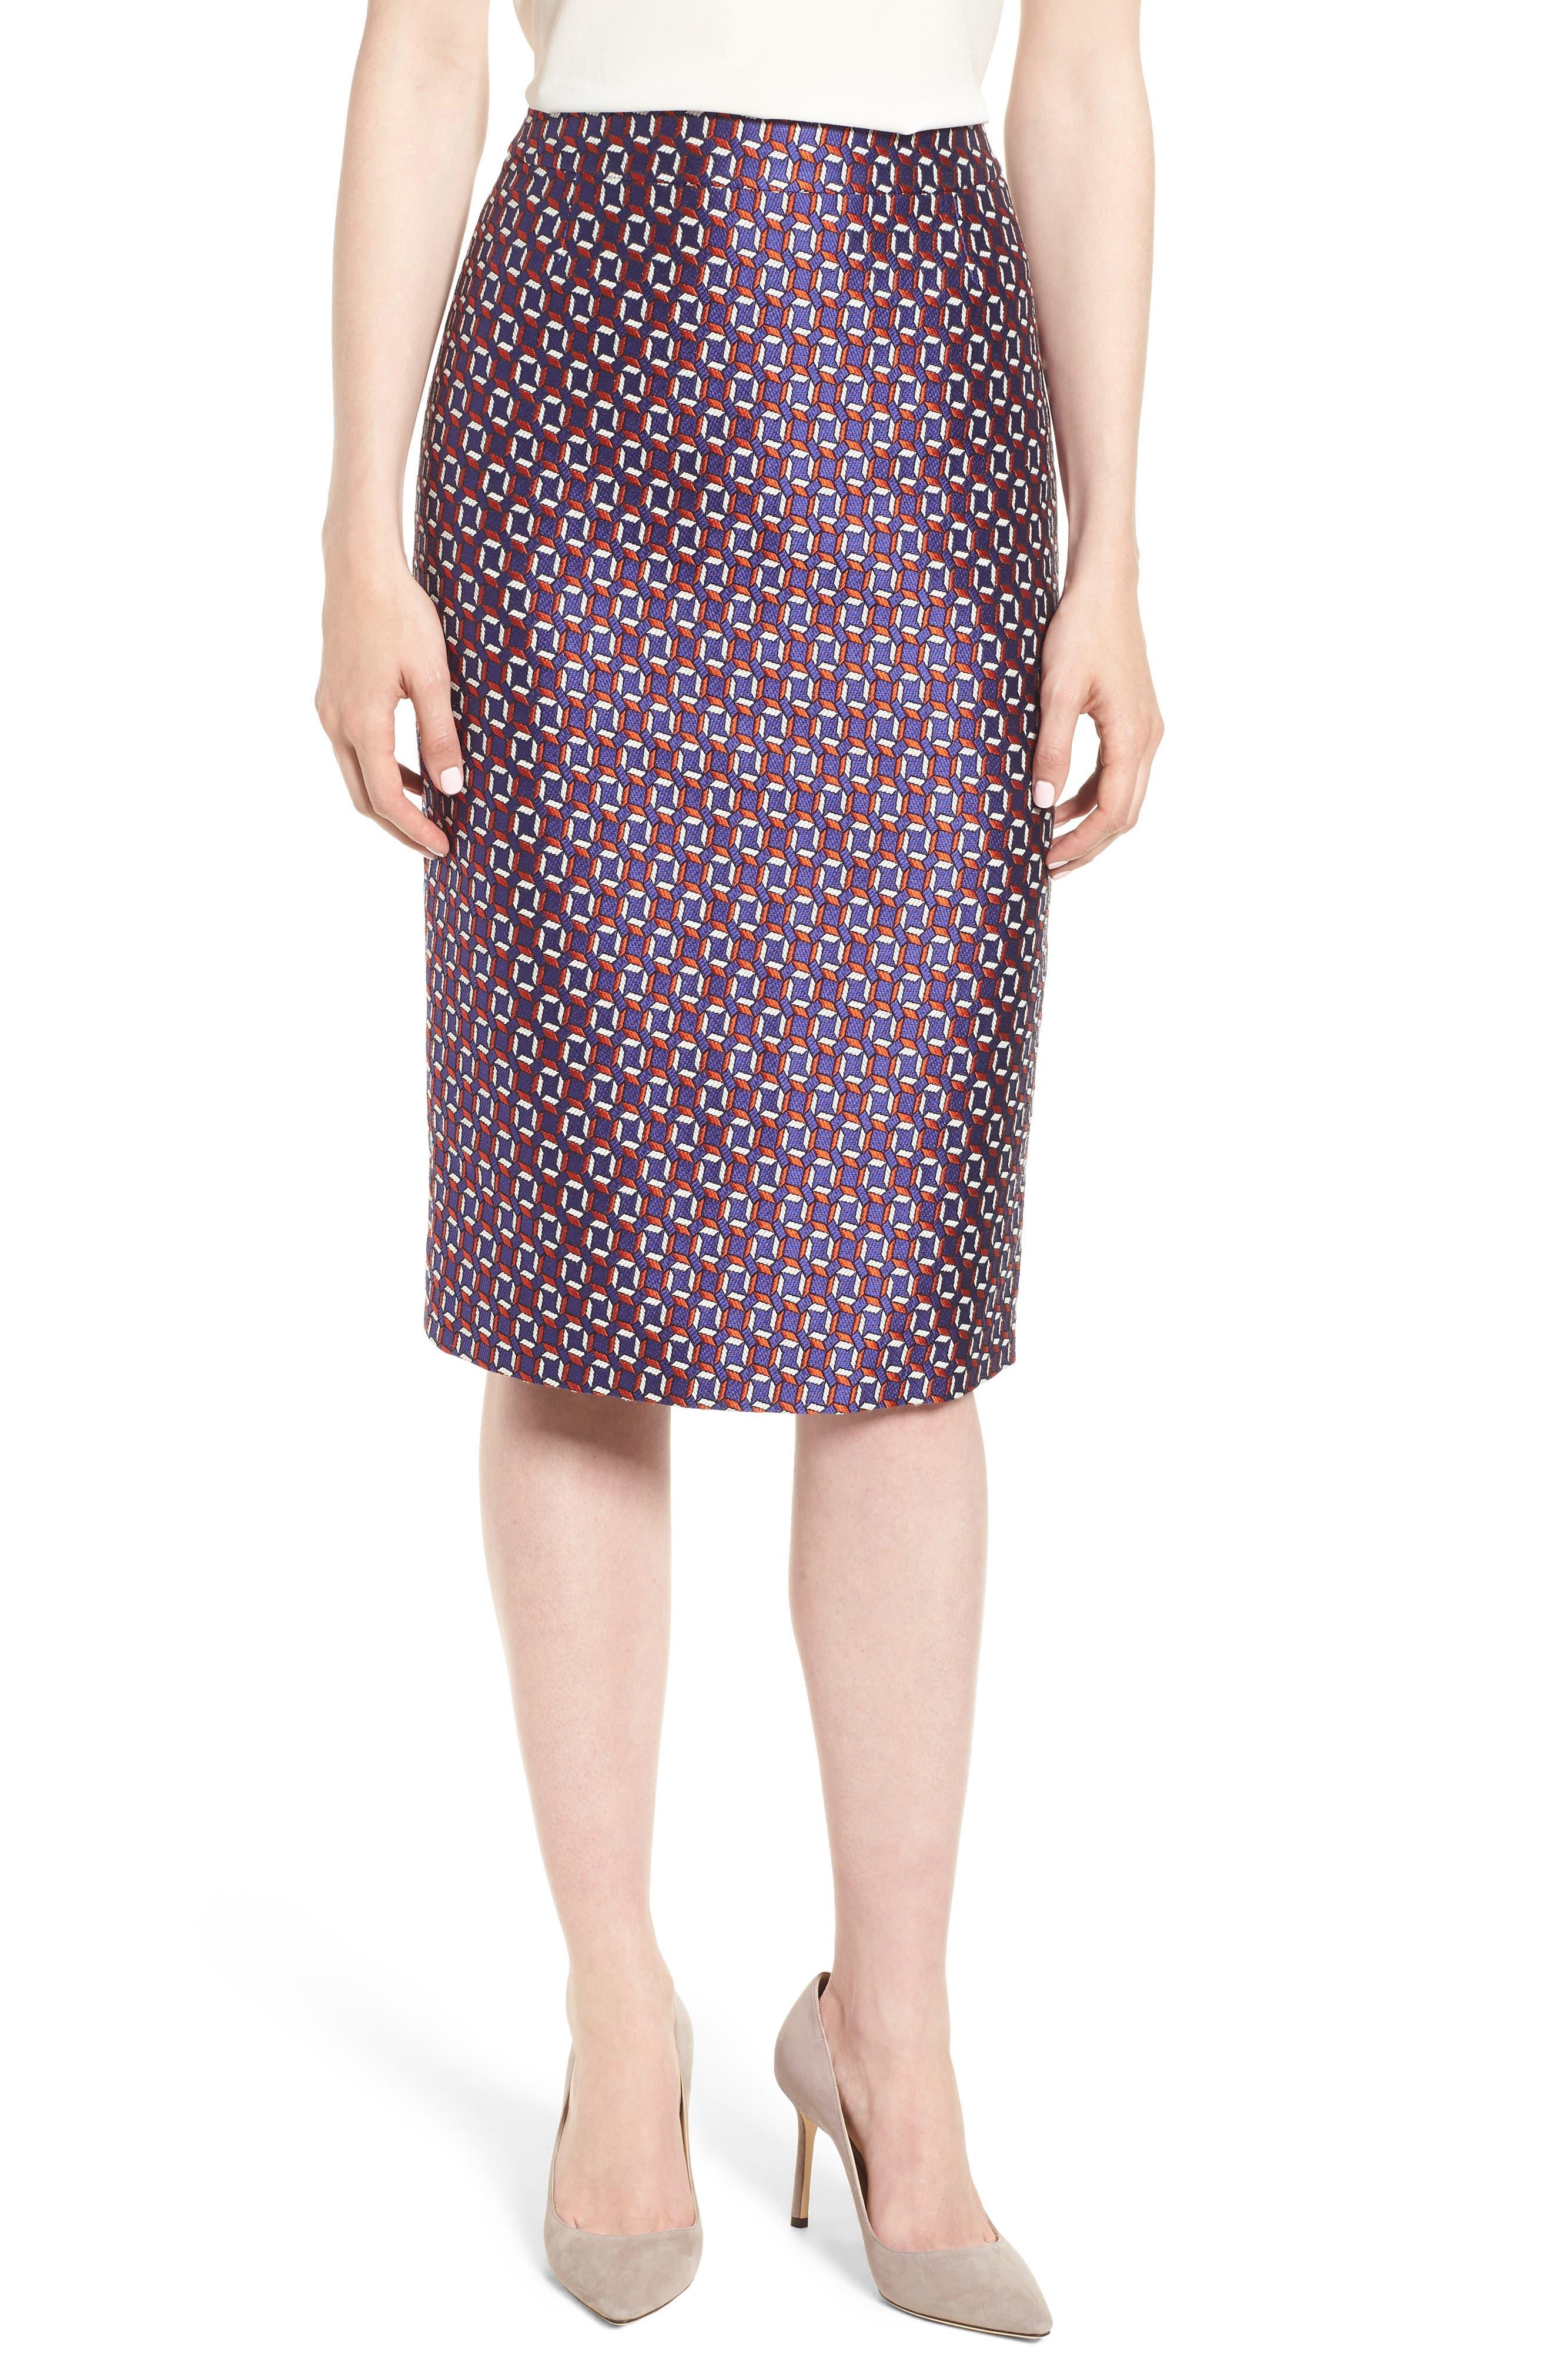 Varines Jacquard Pencil Skirt,                         Main,                         color, 575